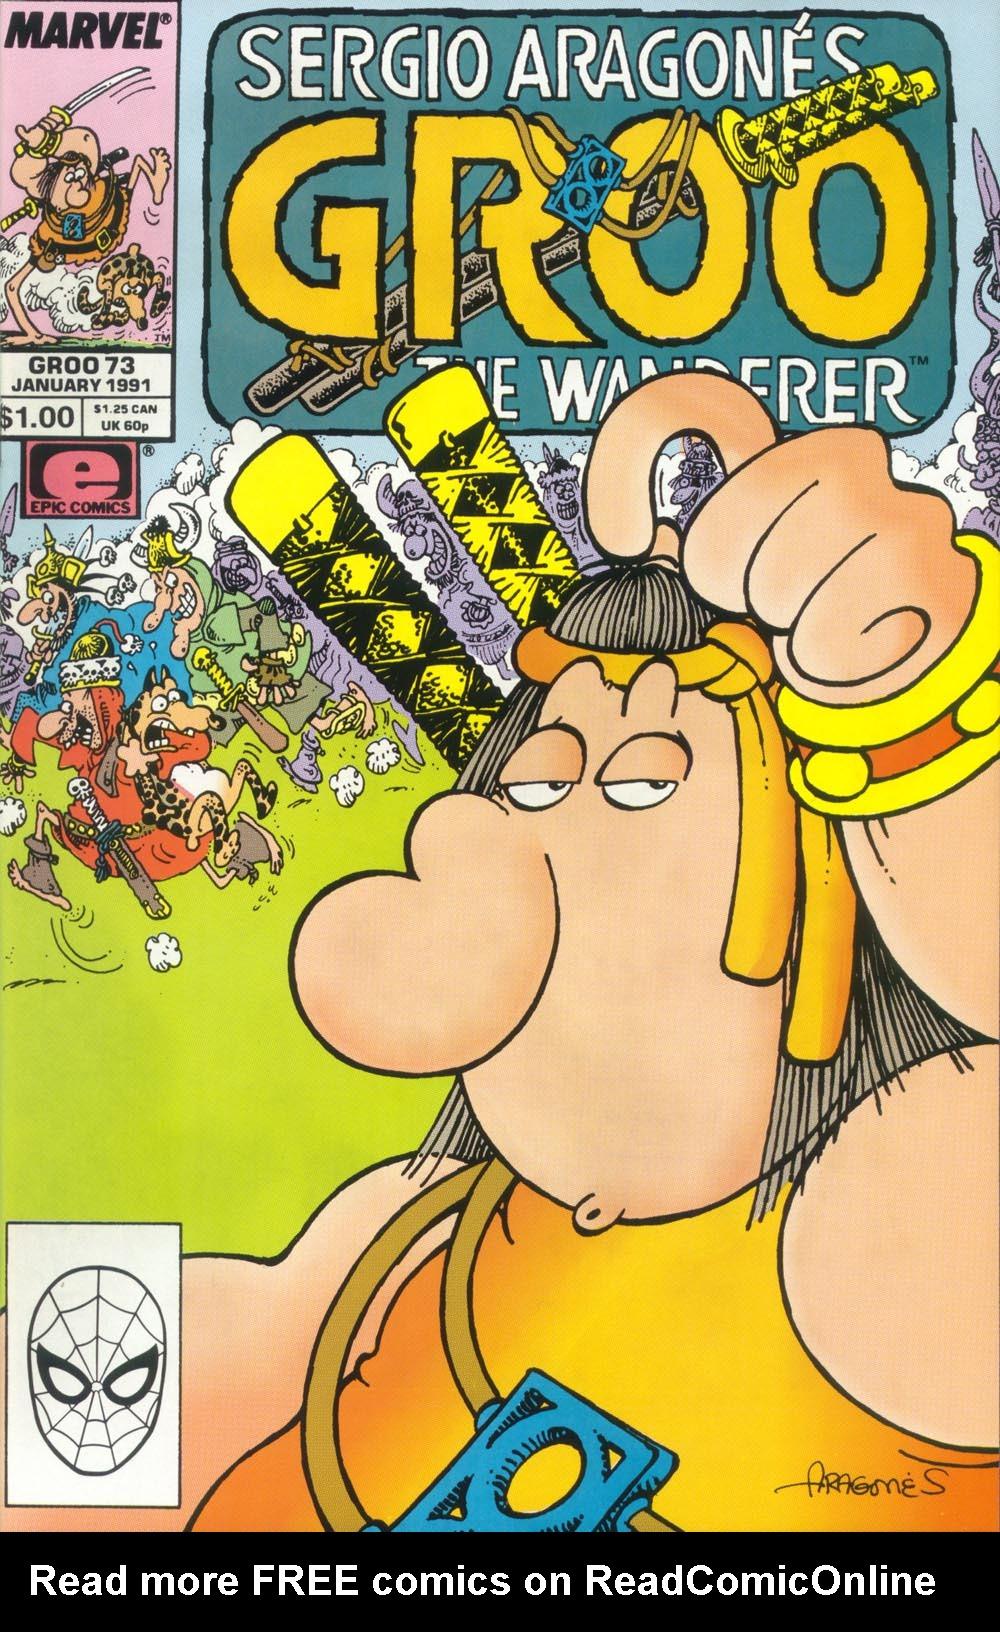 Read online Sergio Aragonés Groo the Wanderer comic -  Issue #73 - 1